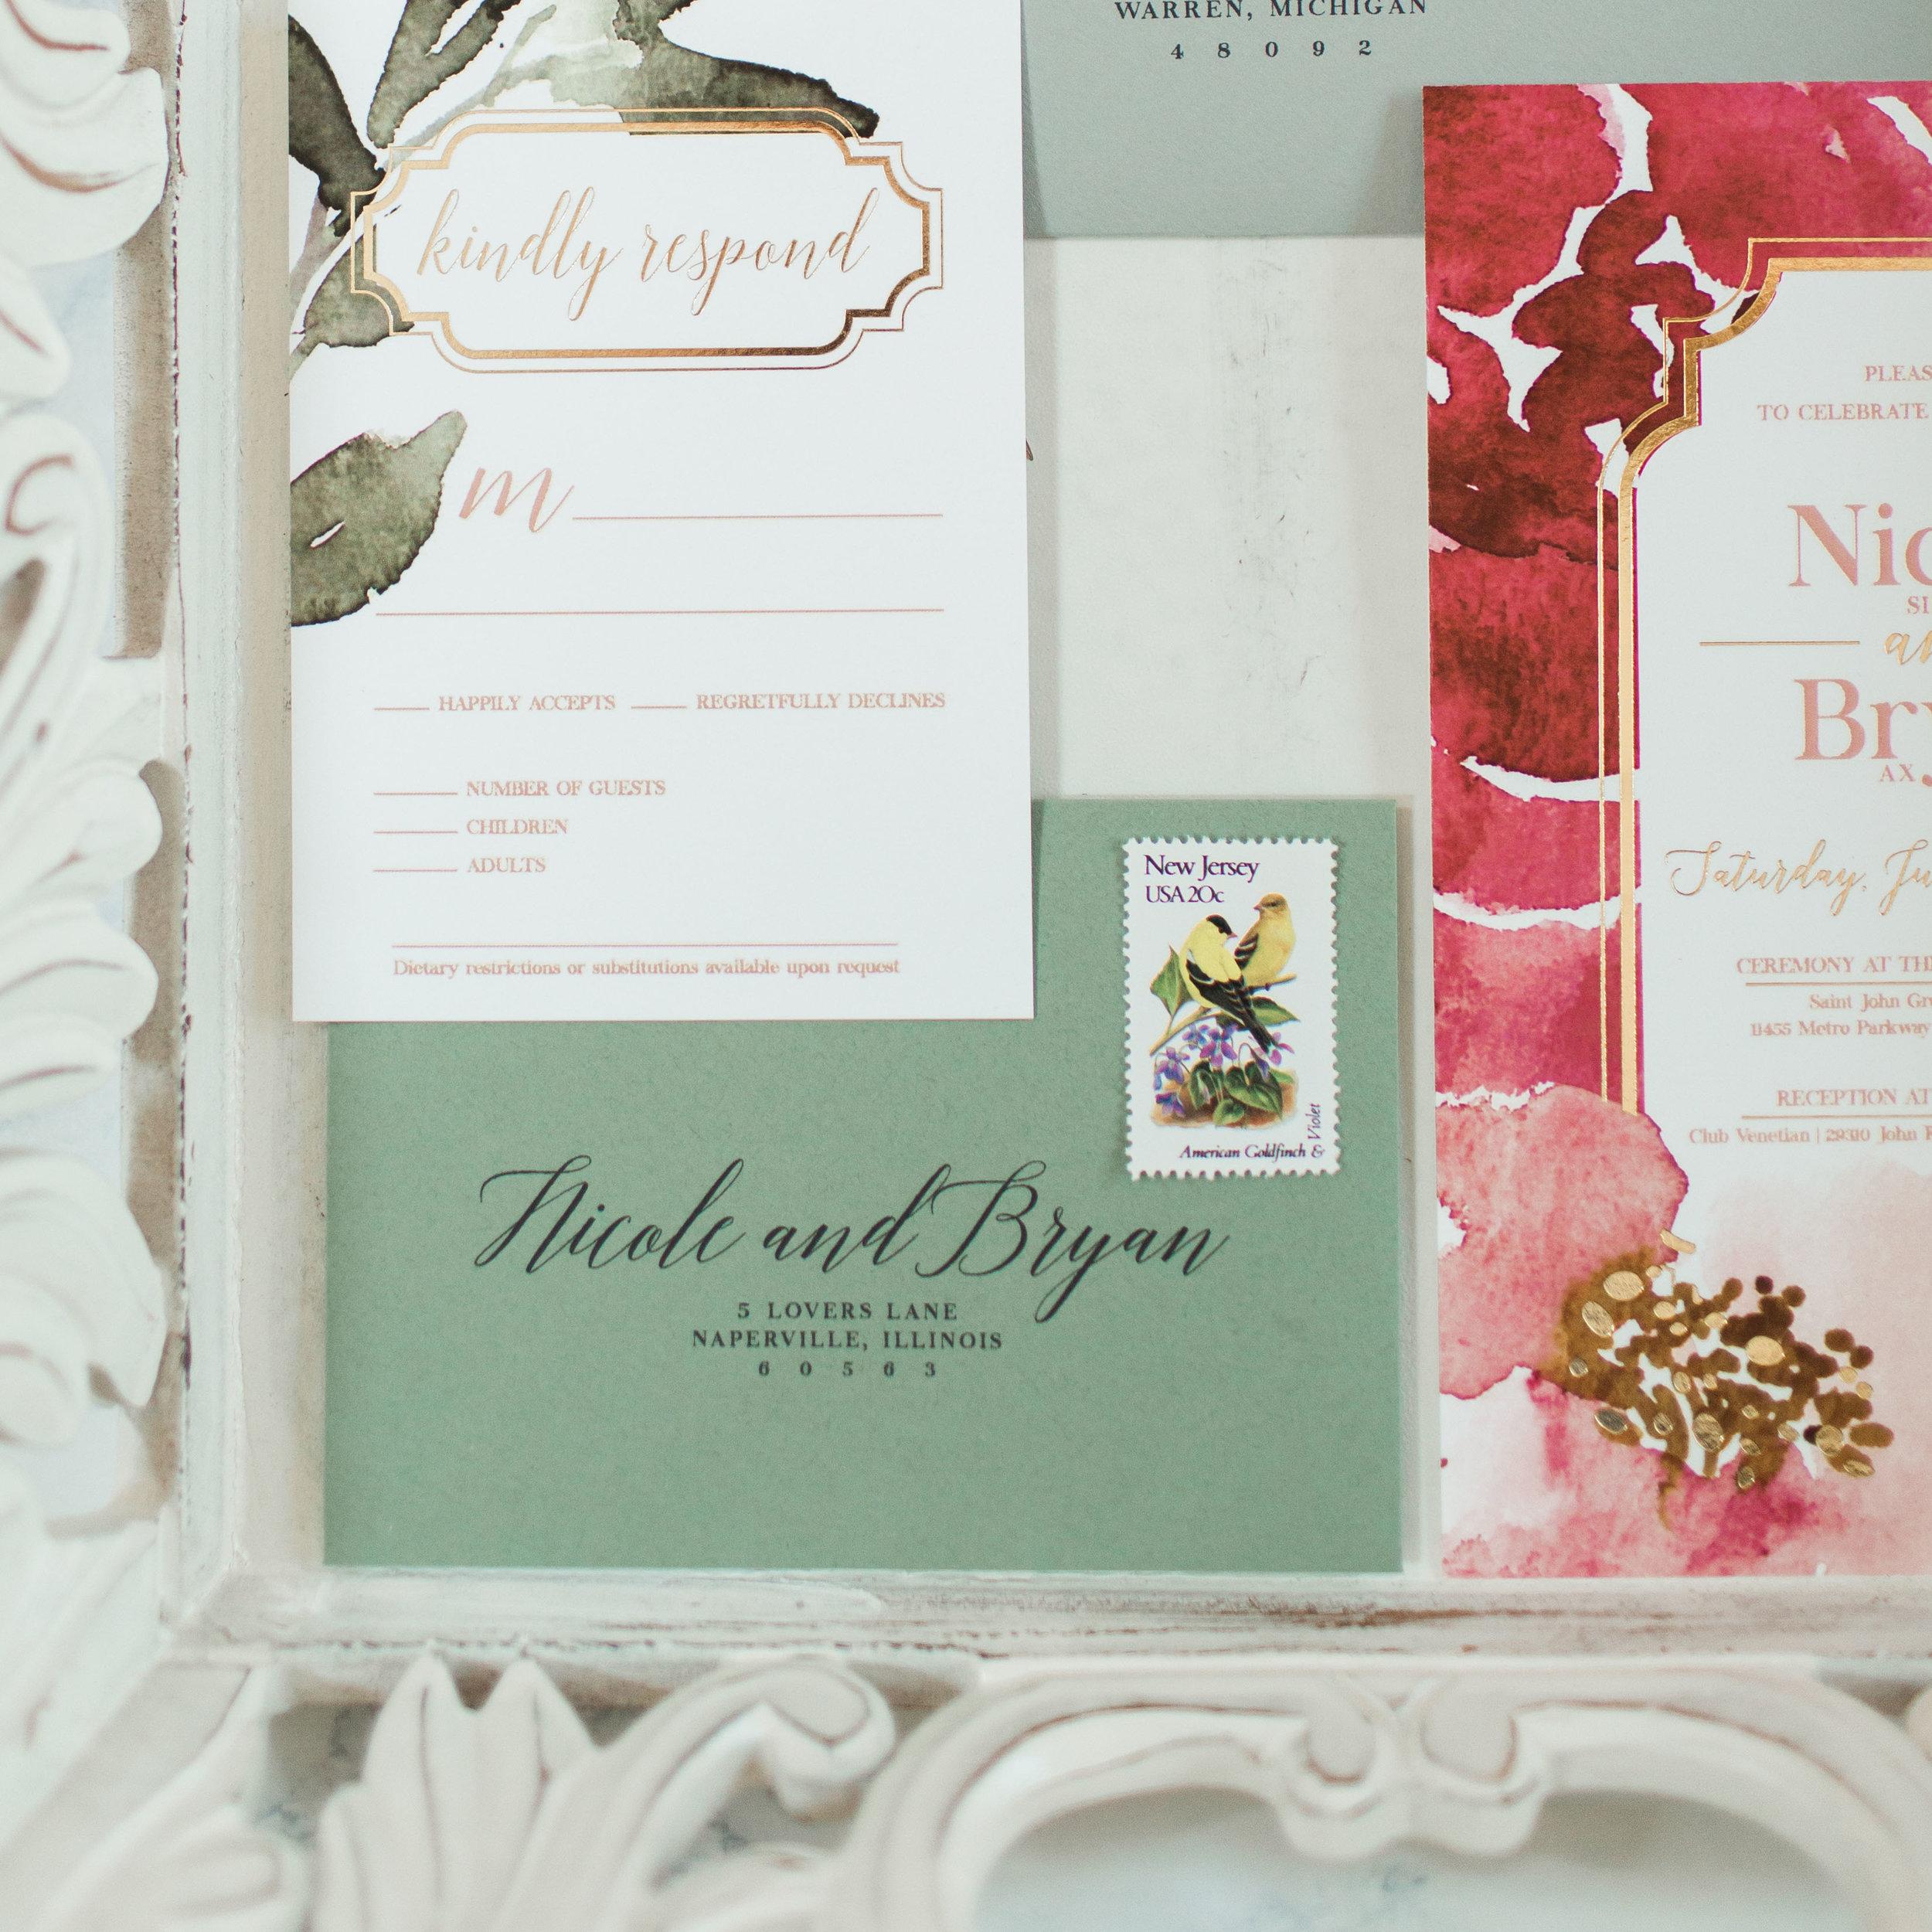 custom gold foil wedding invitations | new jersey wedding invitation designer | princeton invitation designer | elegant and floral wedding invitations